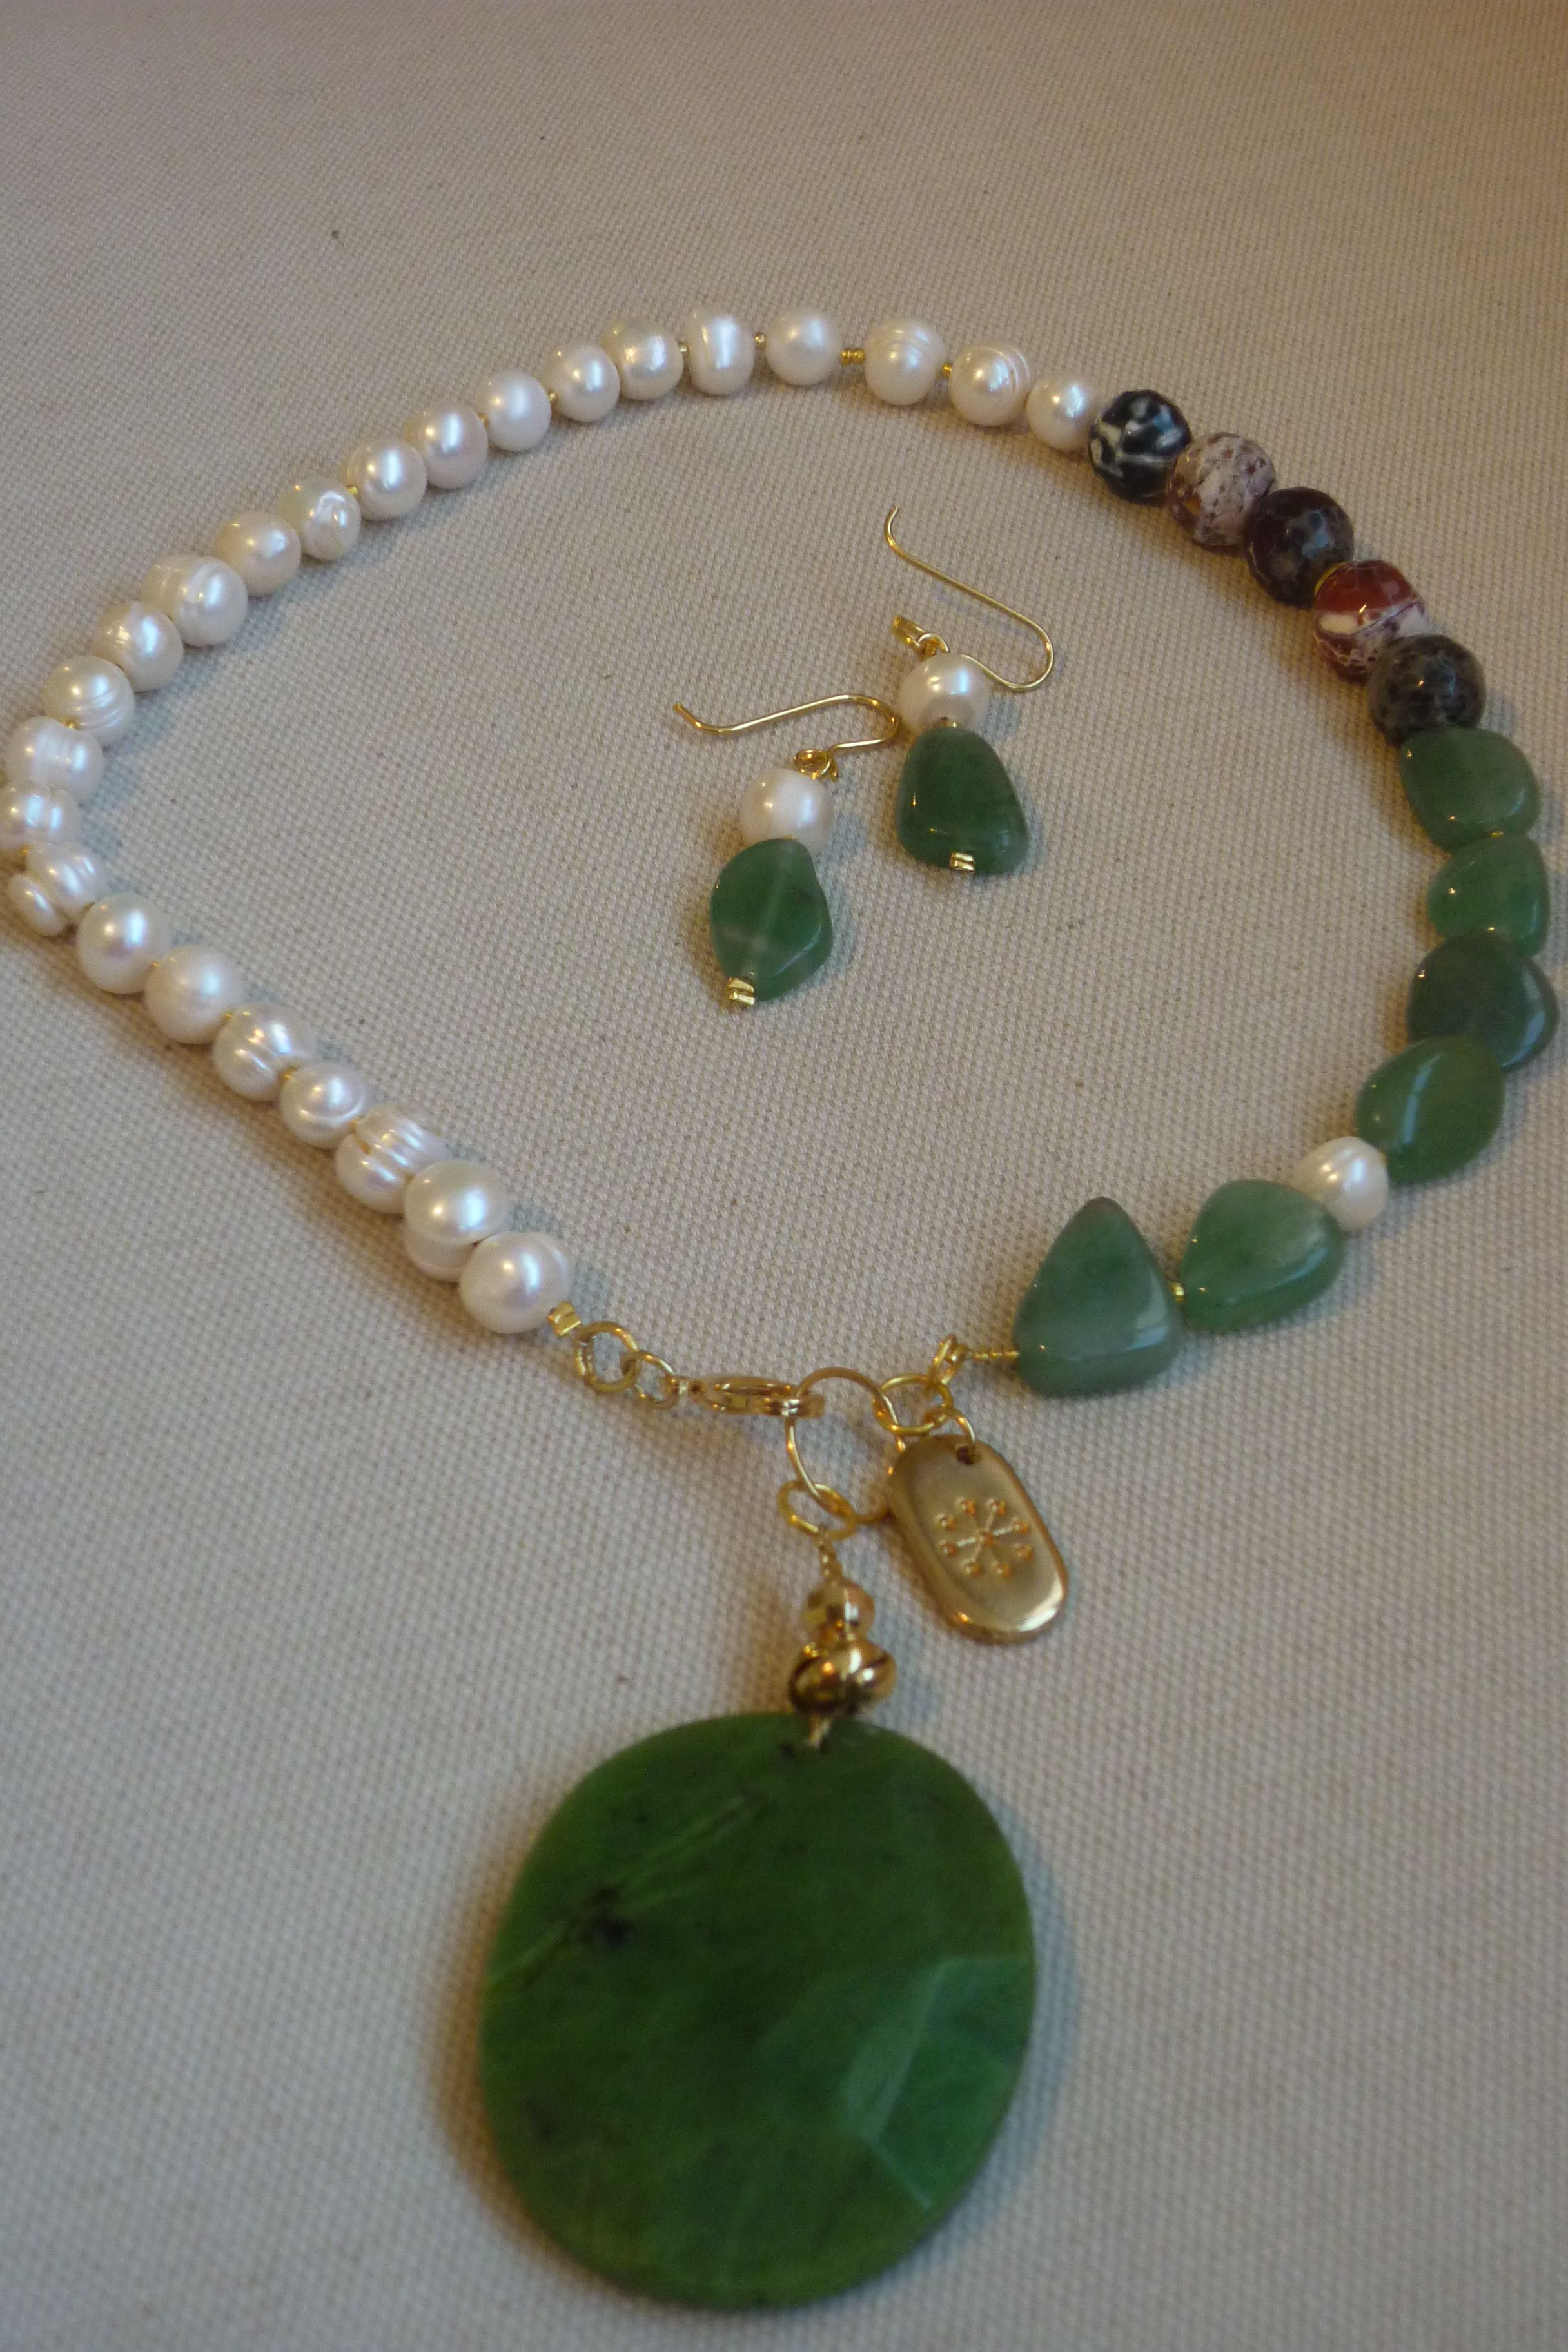 e5872e317a00 Juego de collar pegado al cuello y aretes realizado con perlas ...